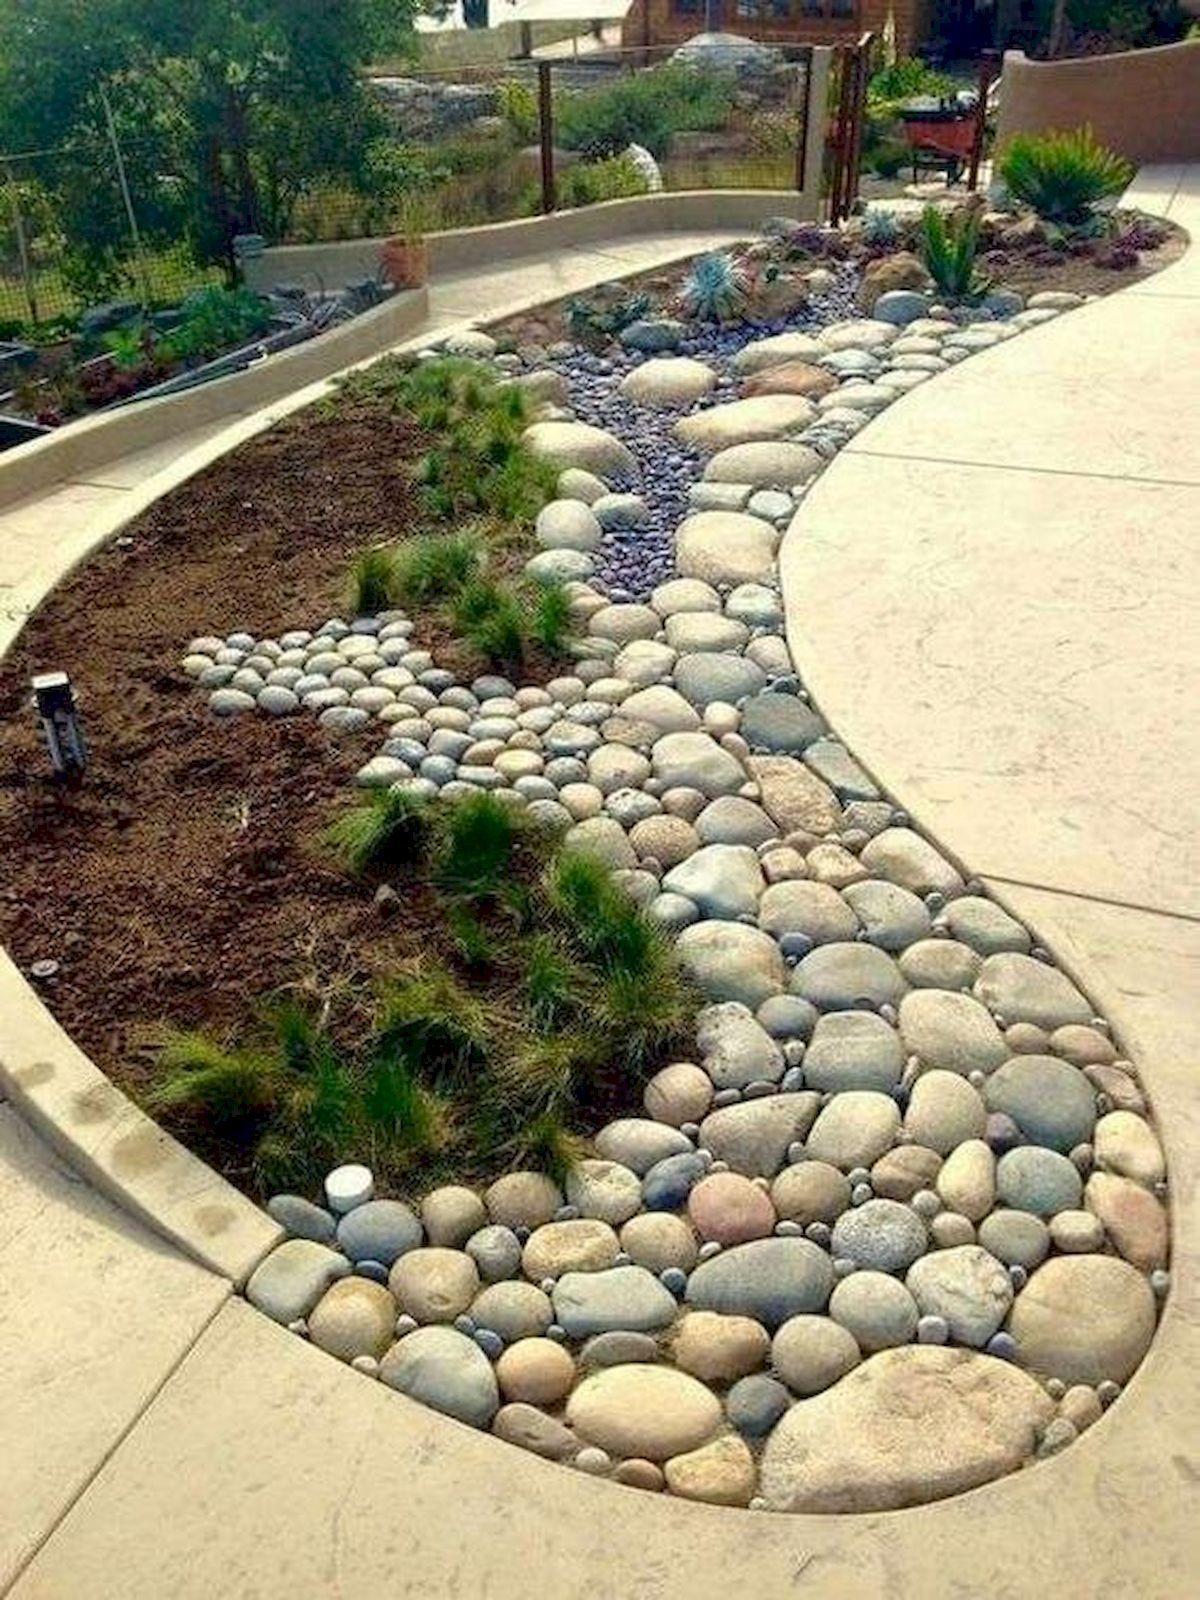 70 Magical Side Yard And Backyard Gravel Garden Design Ideas 3